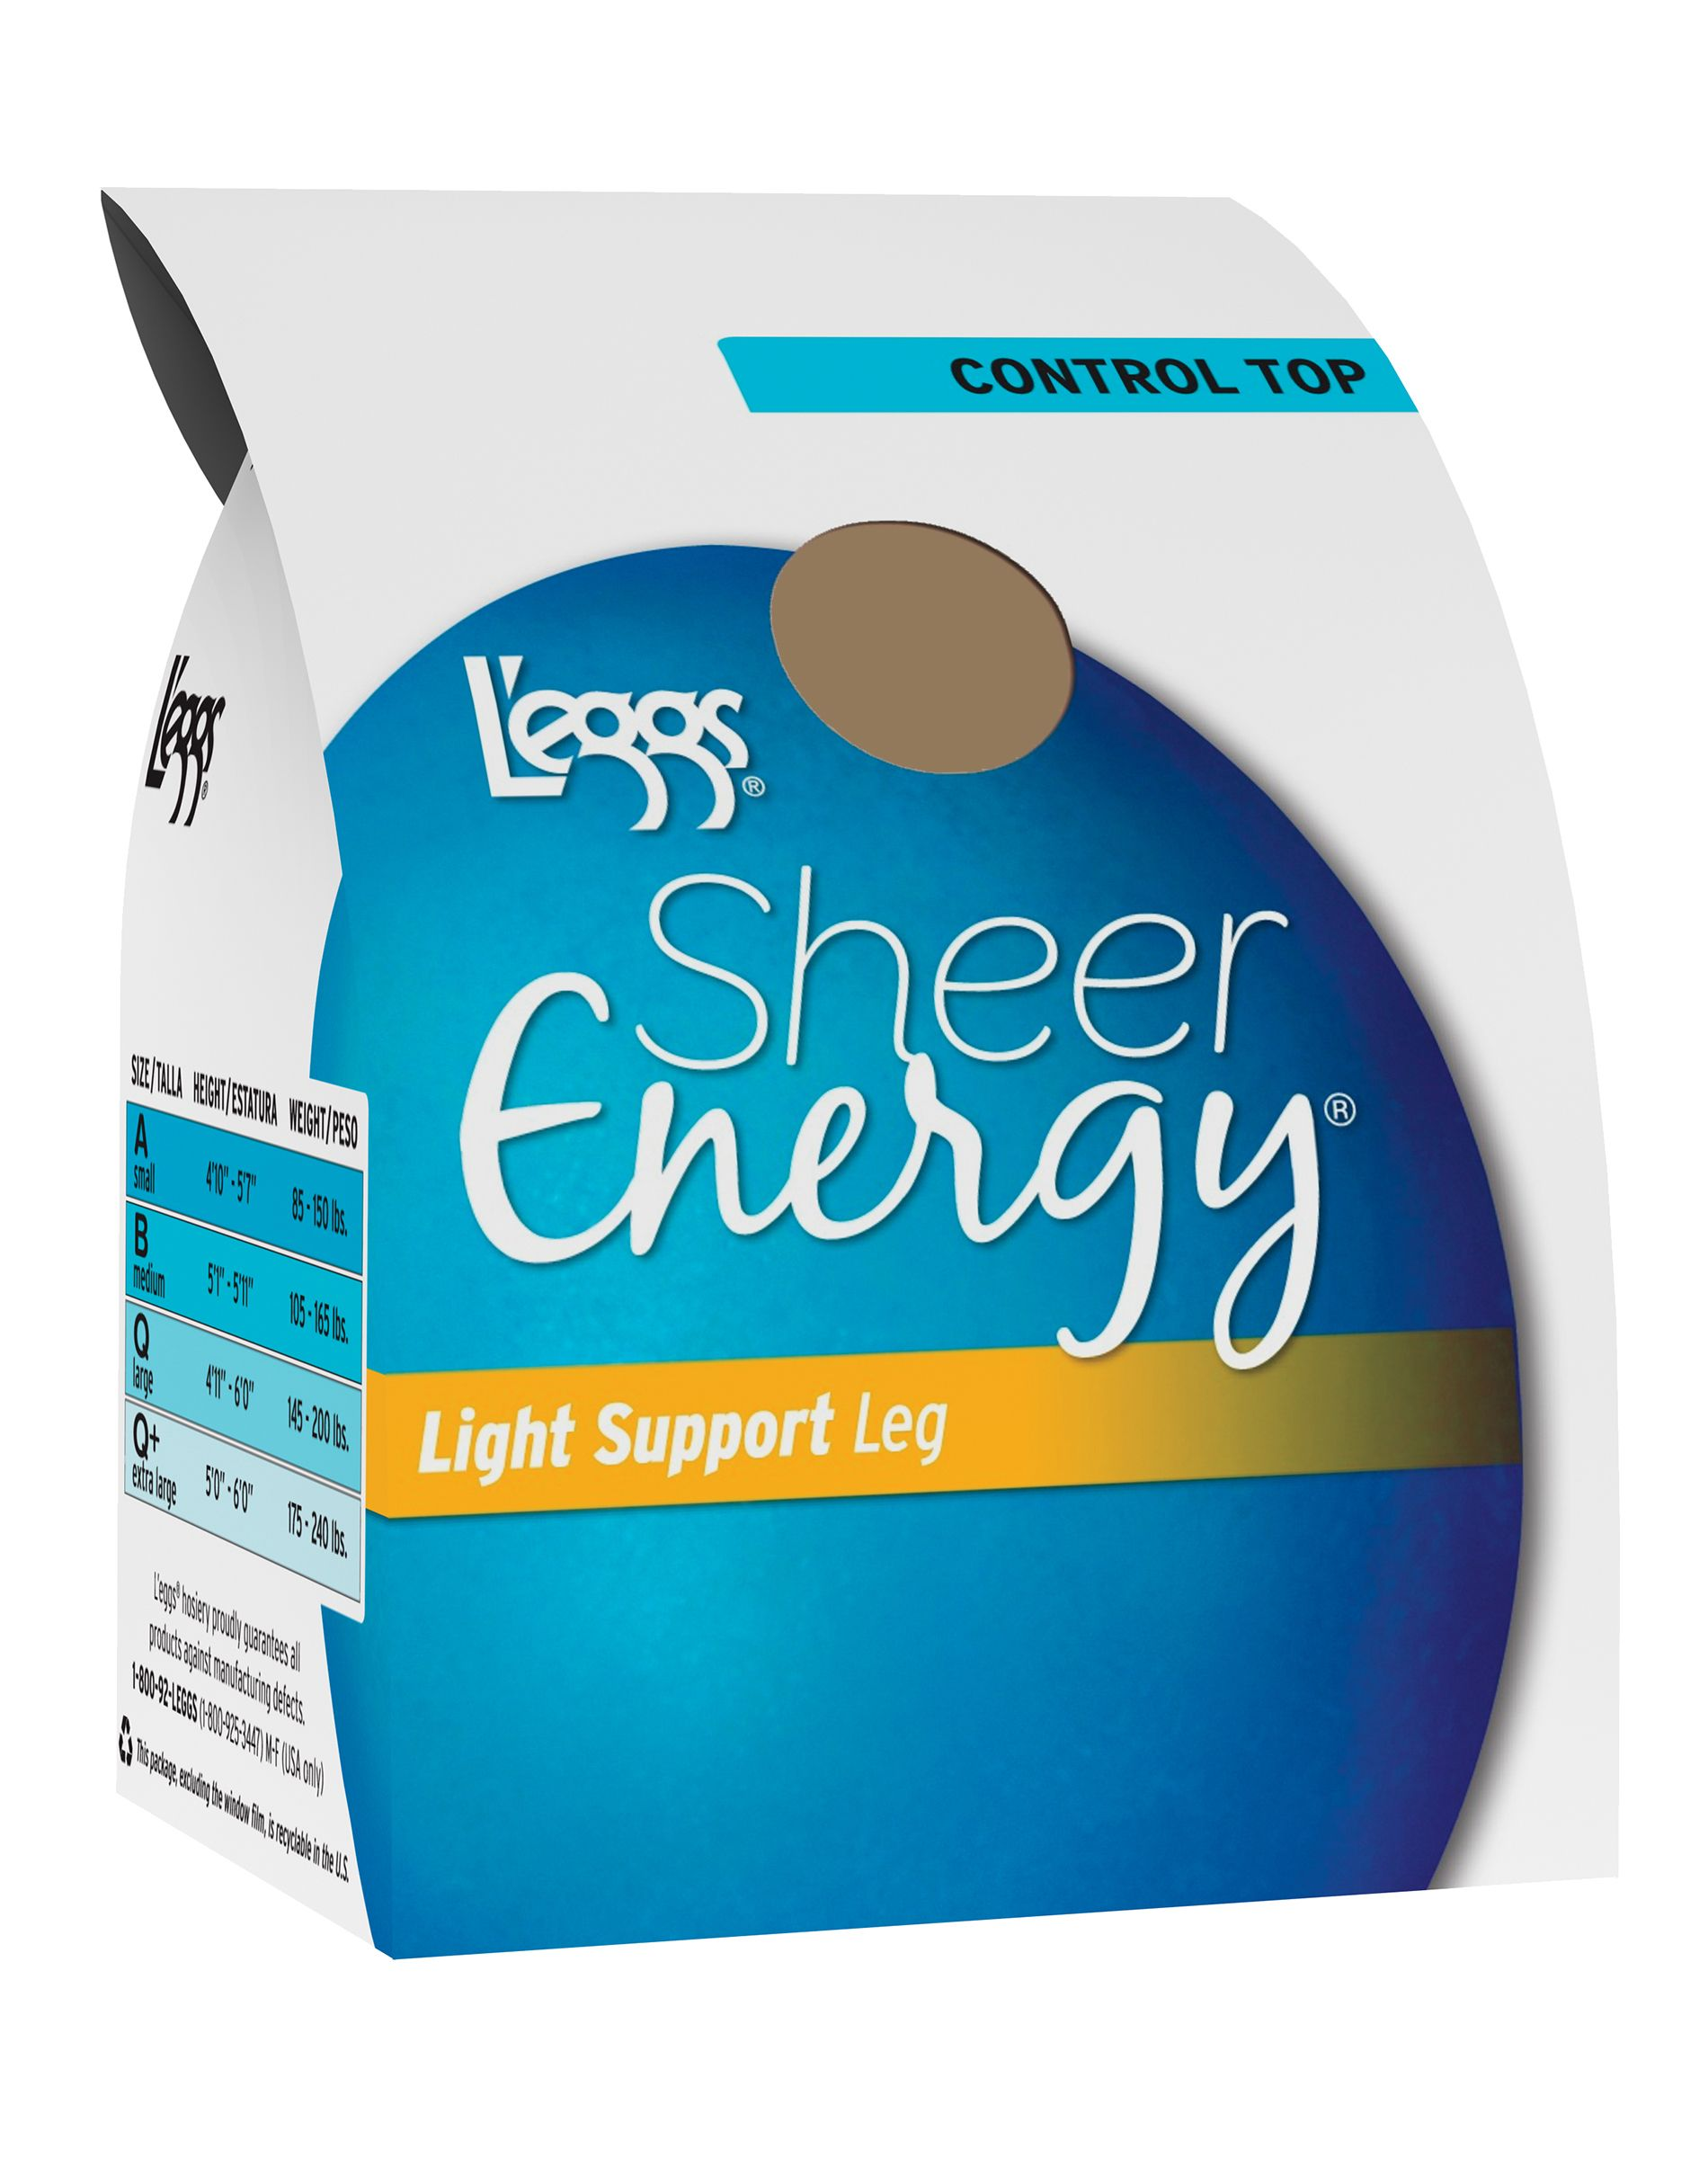 L'eggs Sheer Energy Light Support Leg Control Top, Sheer Toe Pantyhose women L'eggs